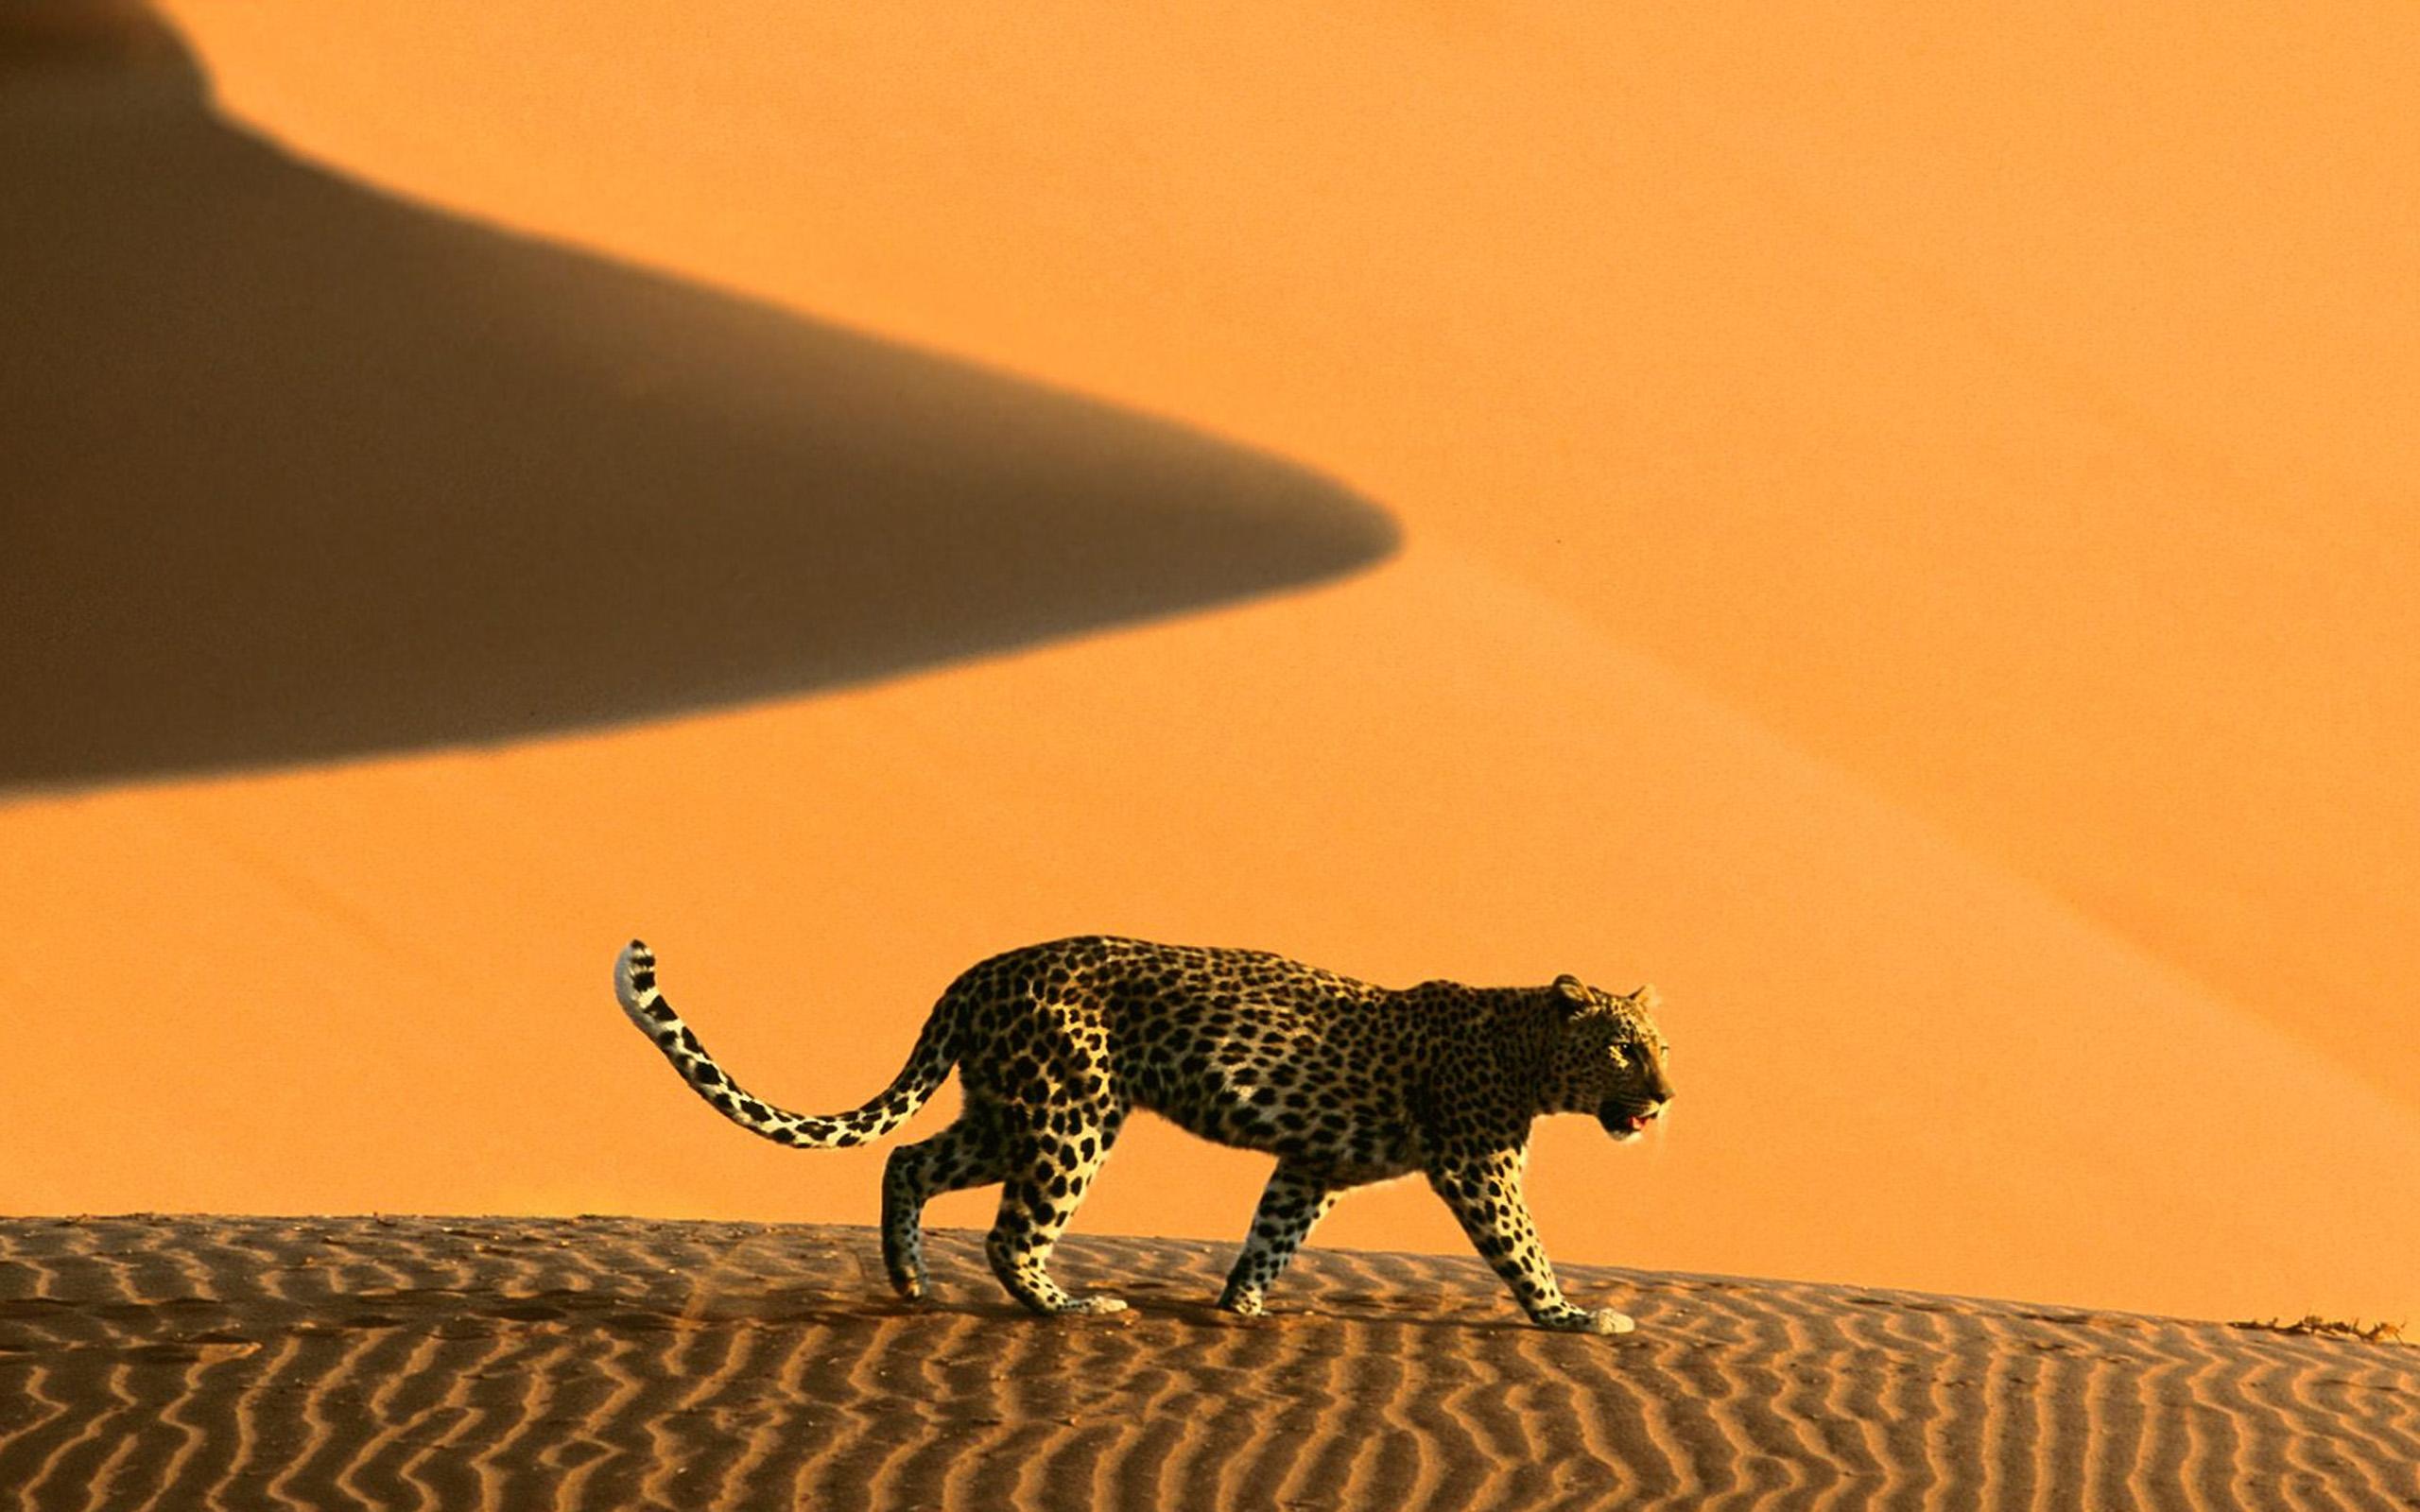 Leopard in Namib Desert